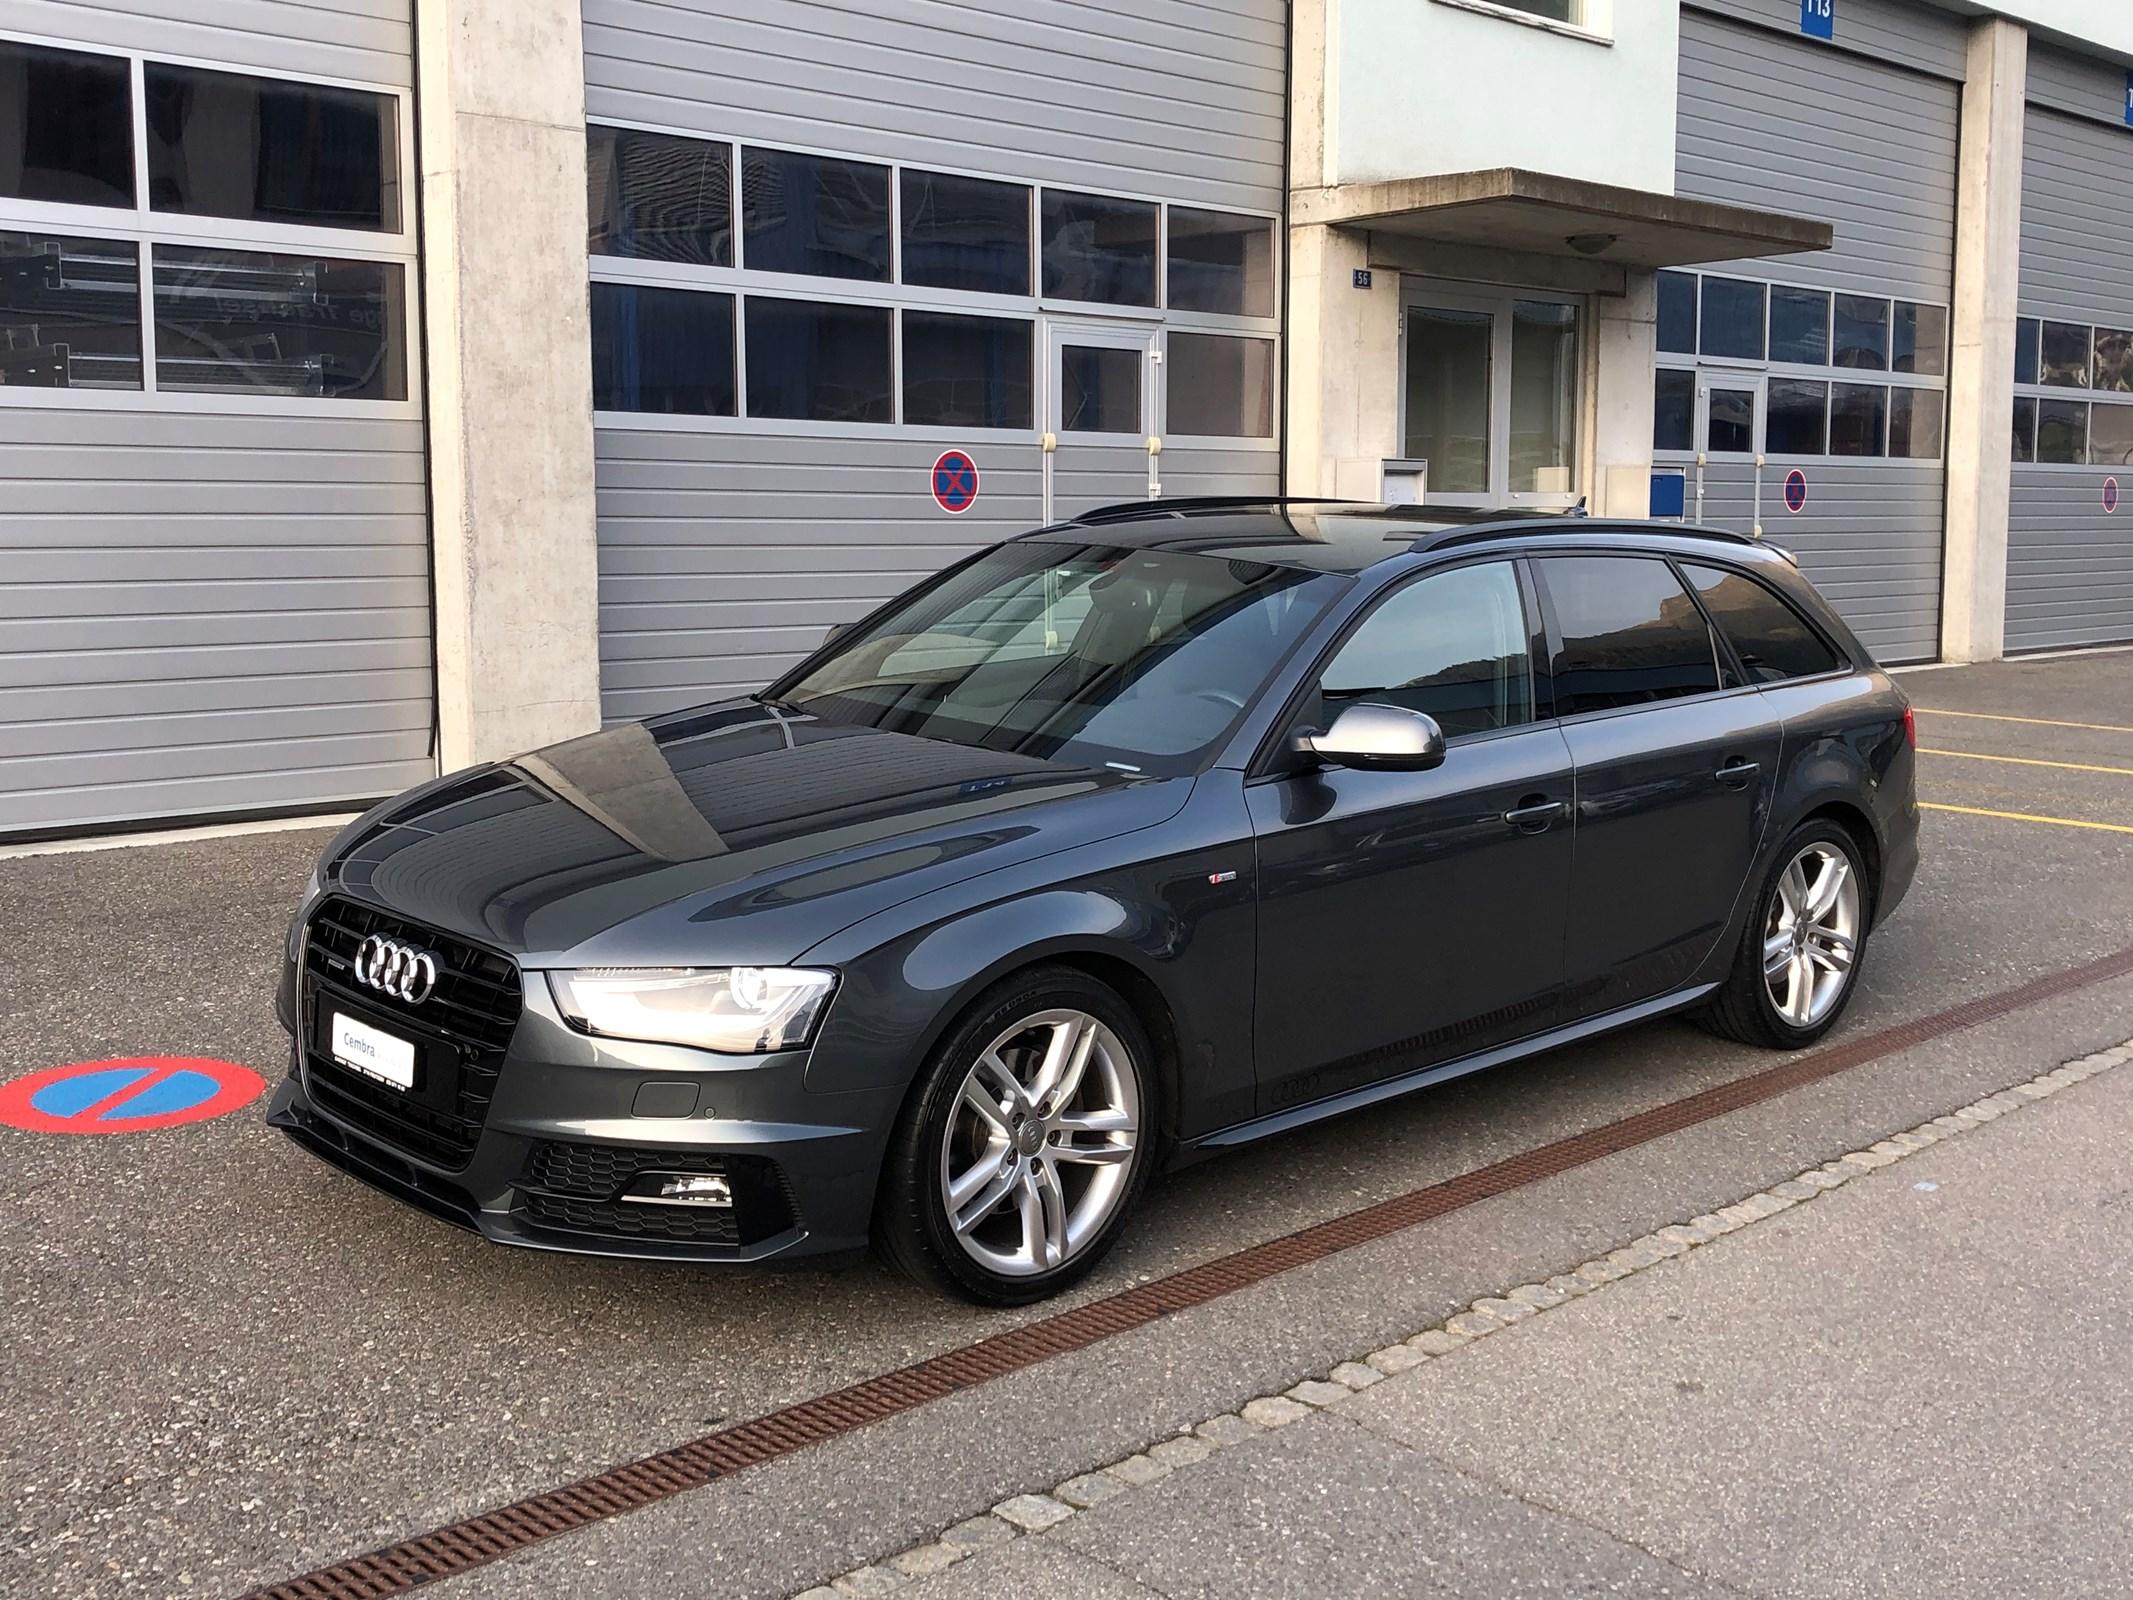 estate Audi A4 Avant 2.0 TDI quattro